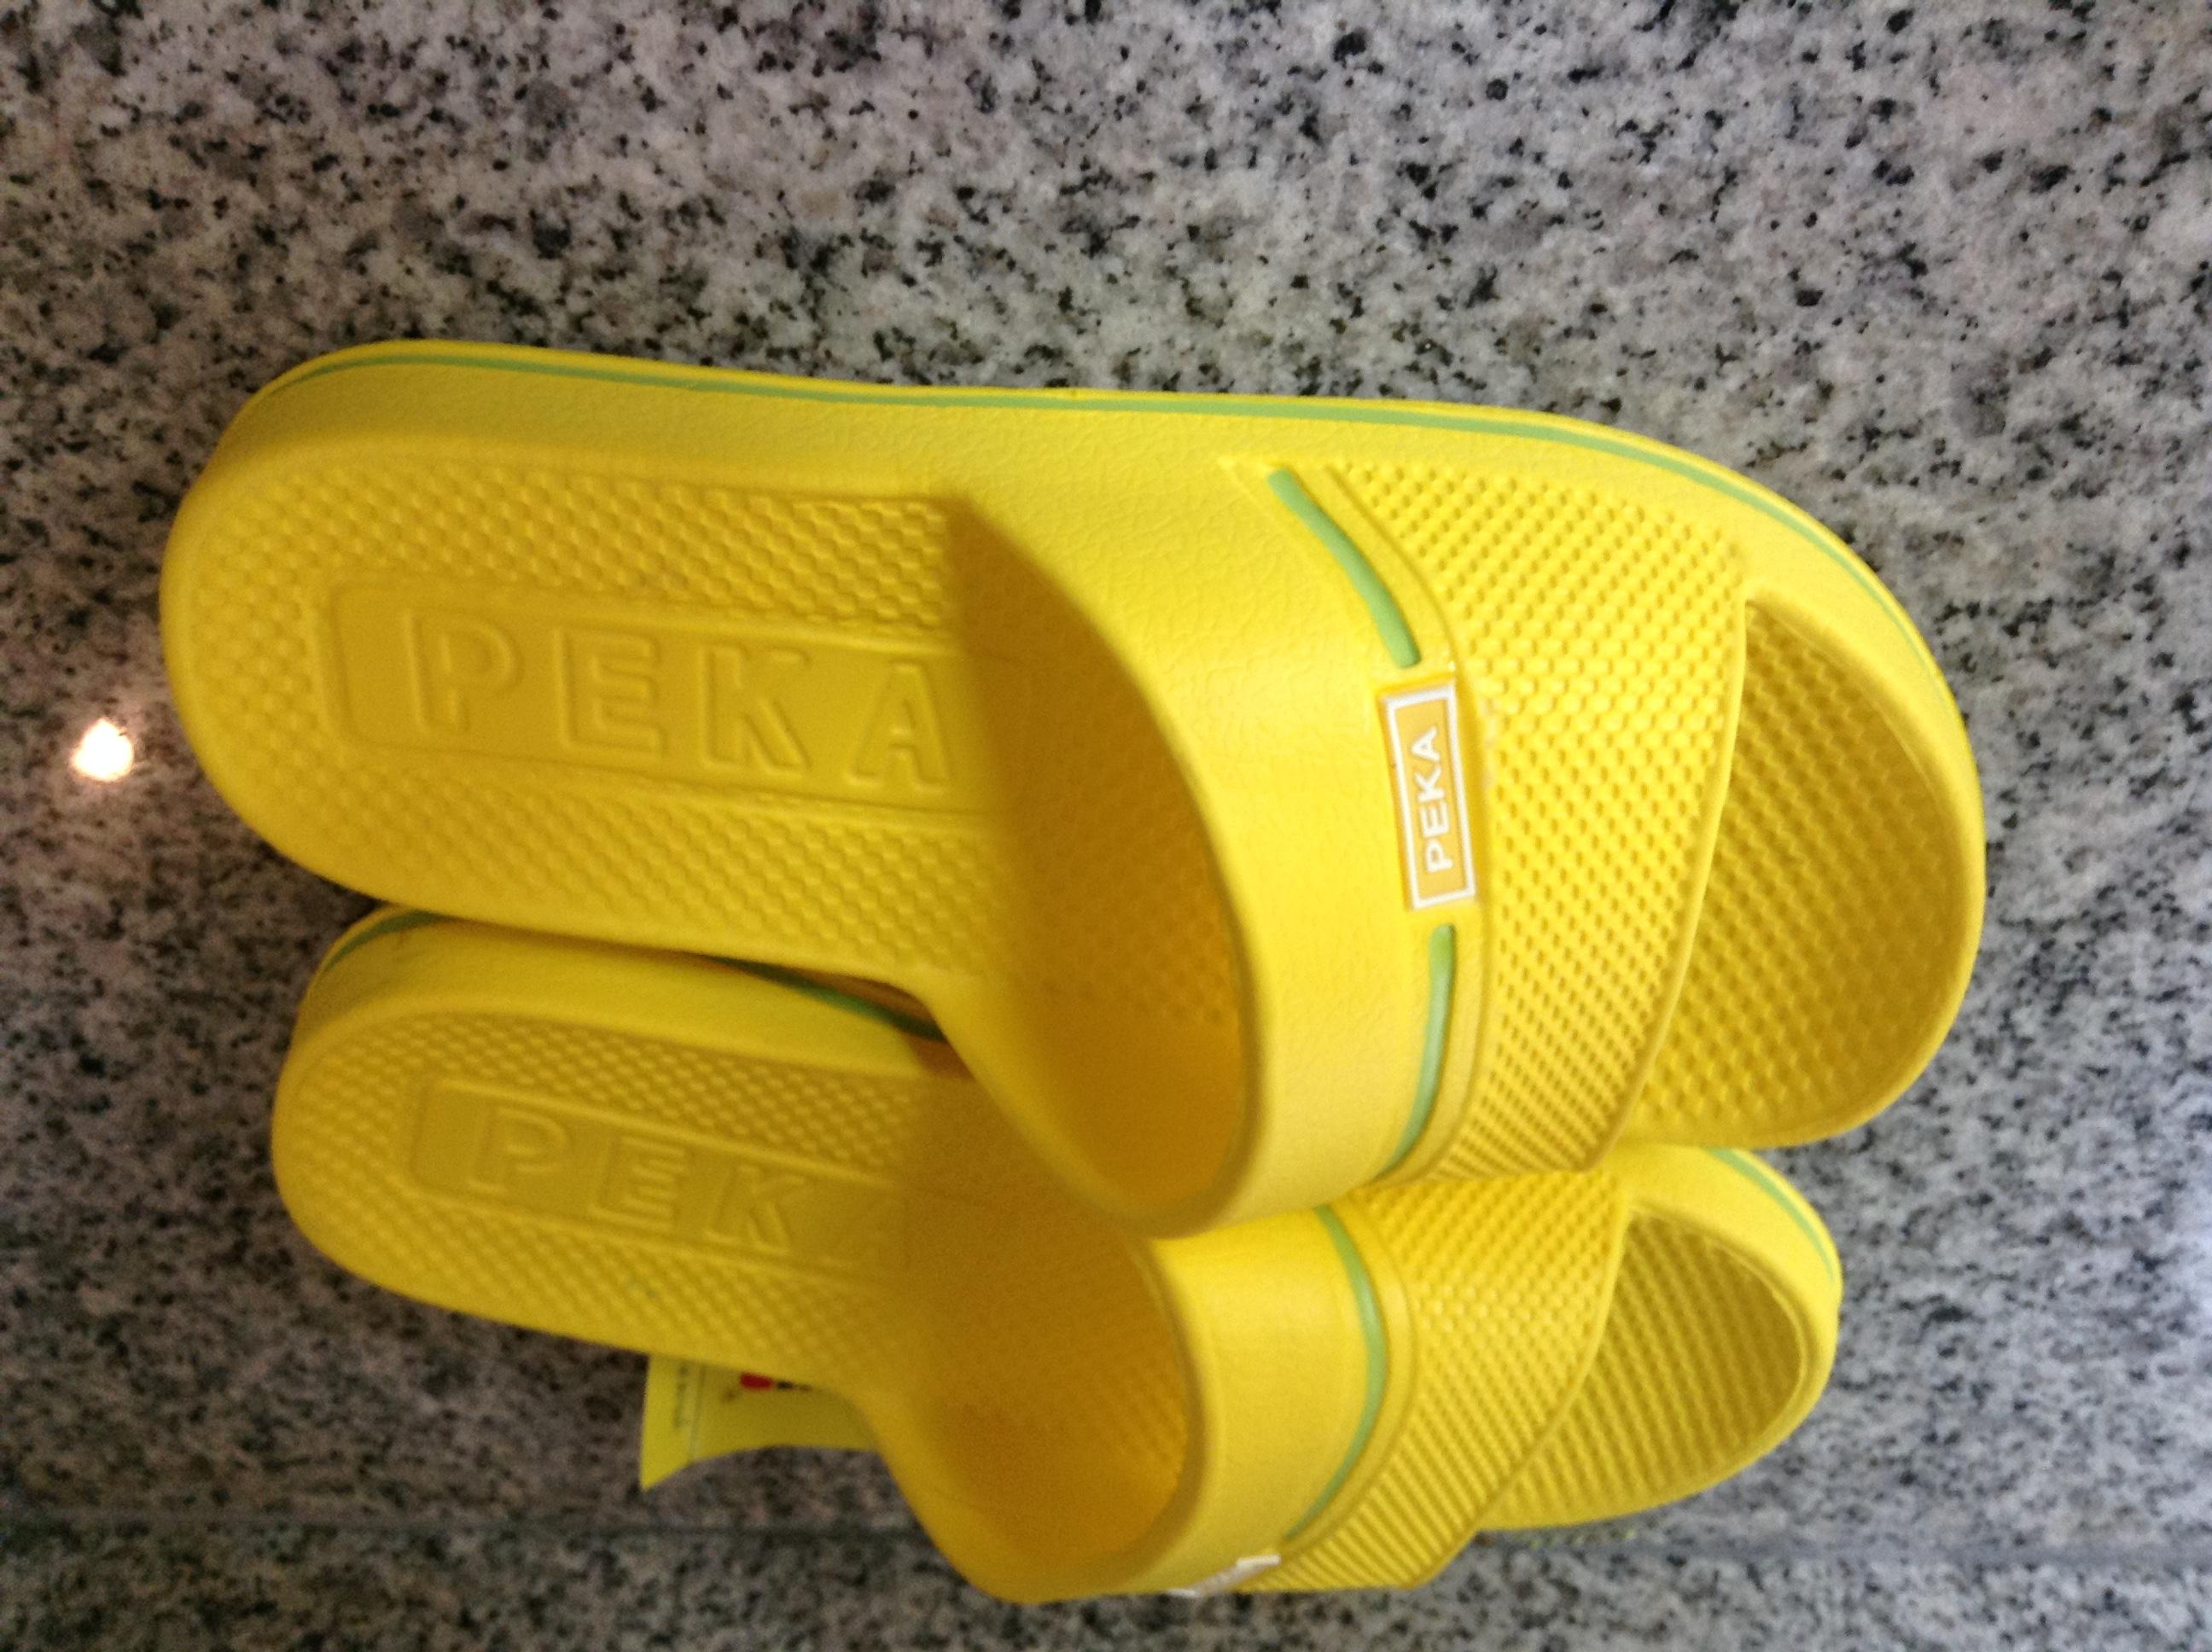 0698dc4fa PEKA Kids Flip Flops Sandals Yellow Sandals Shoes, Beach Sandals Size 33 =  200mm